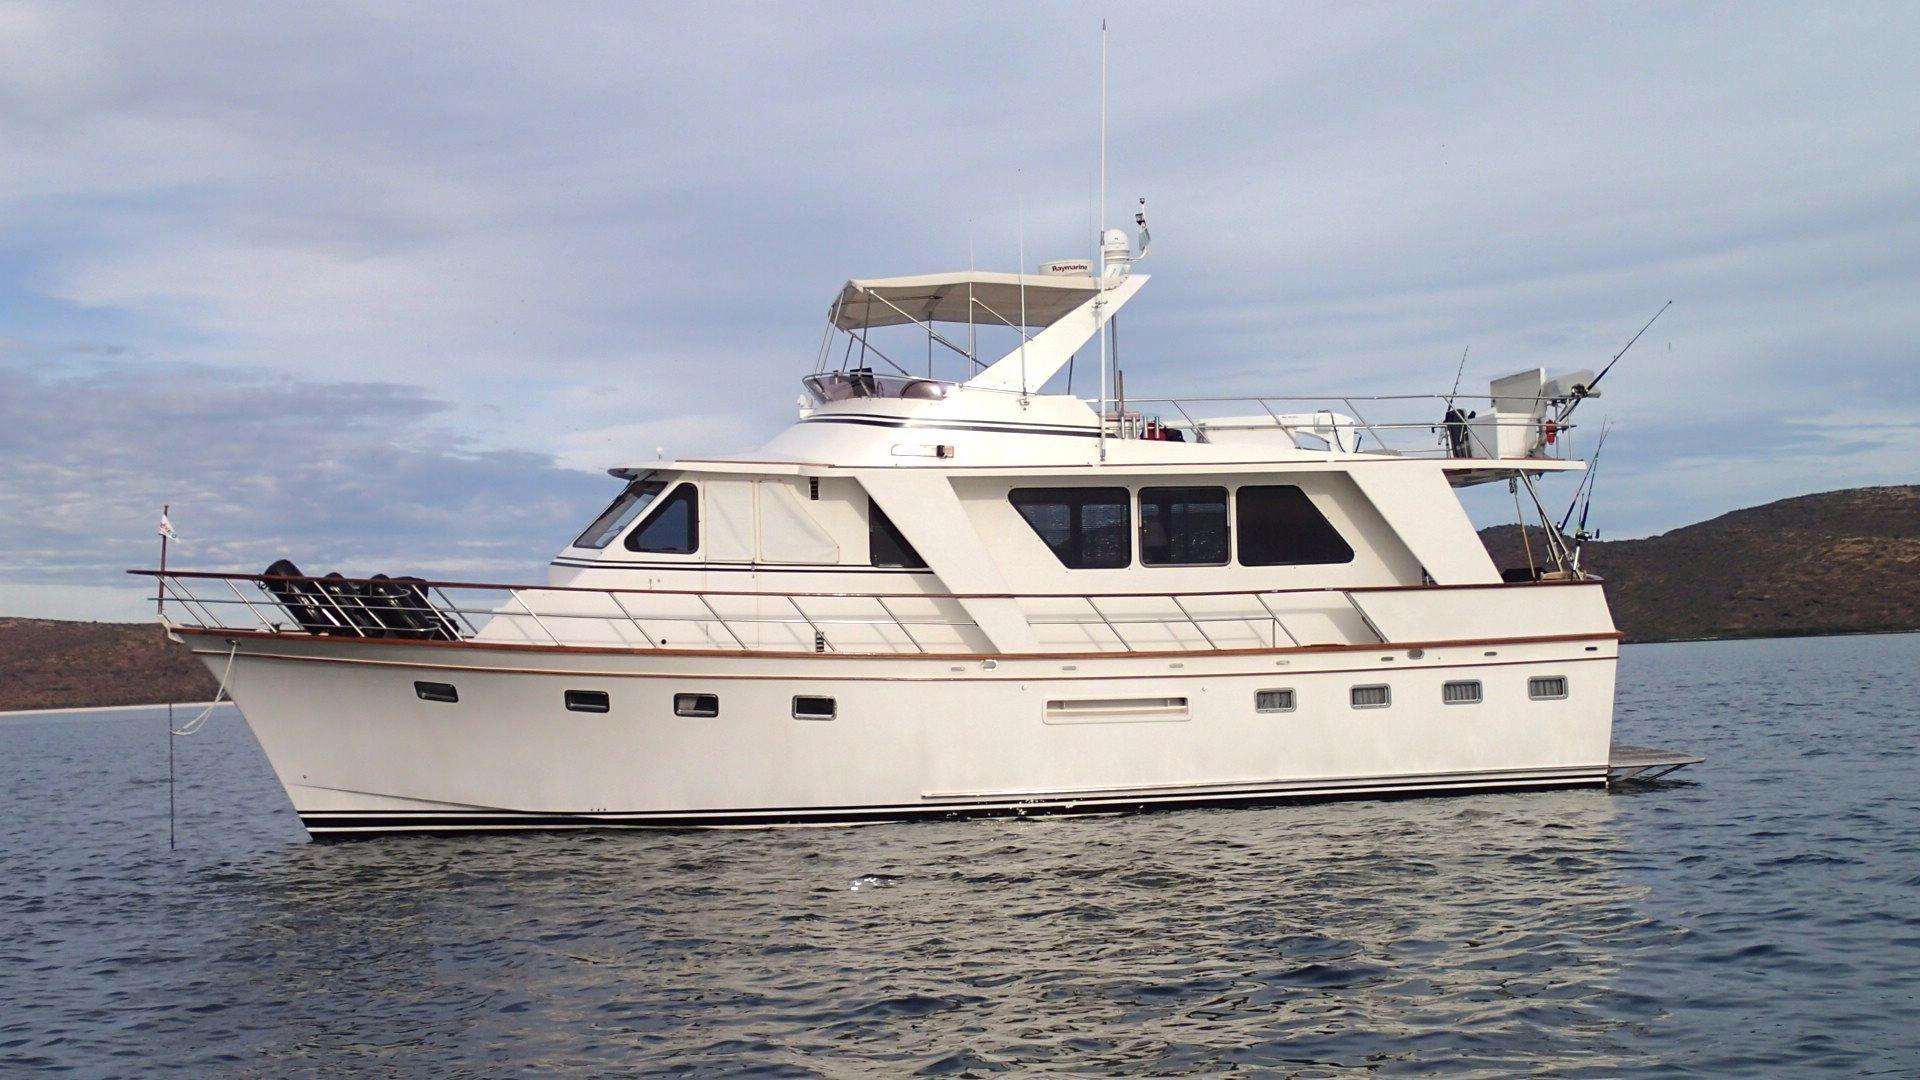 53' DeFever Performance Offshore Cruiser+Boat for sale!